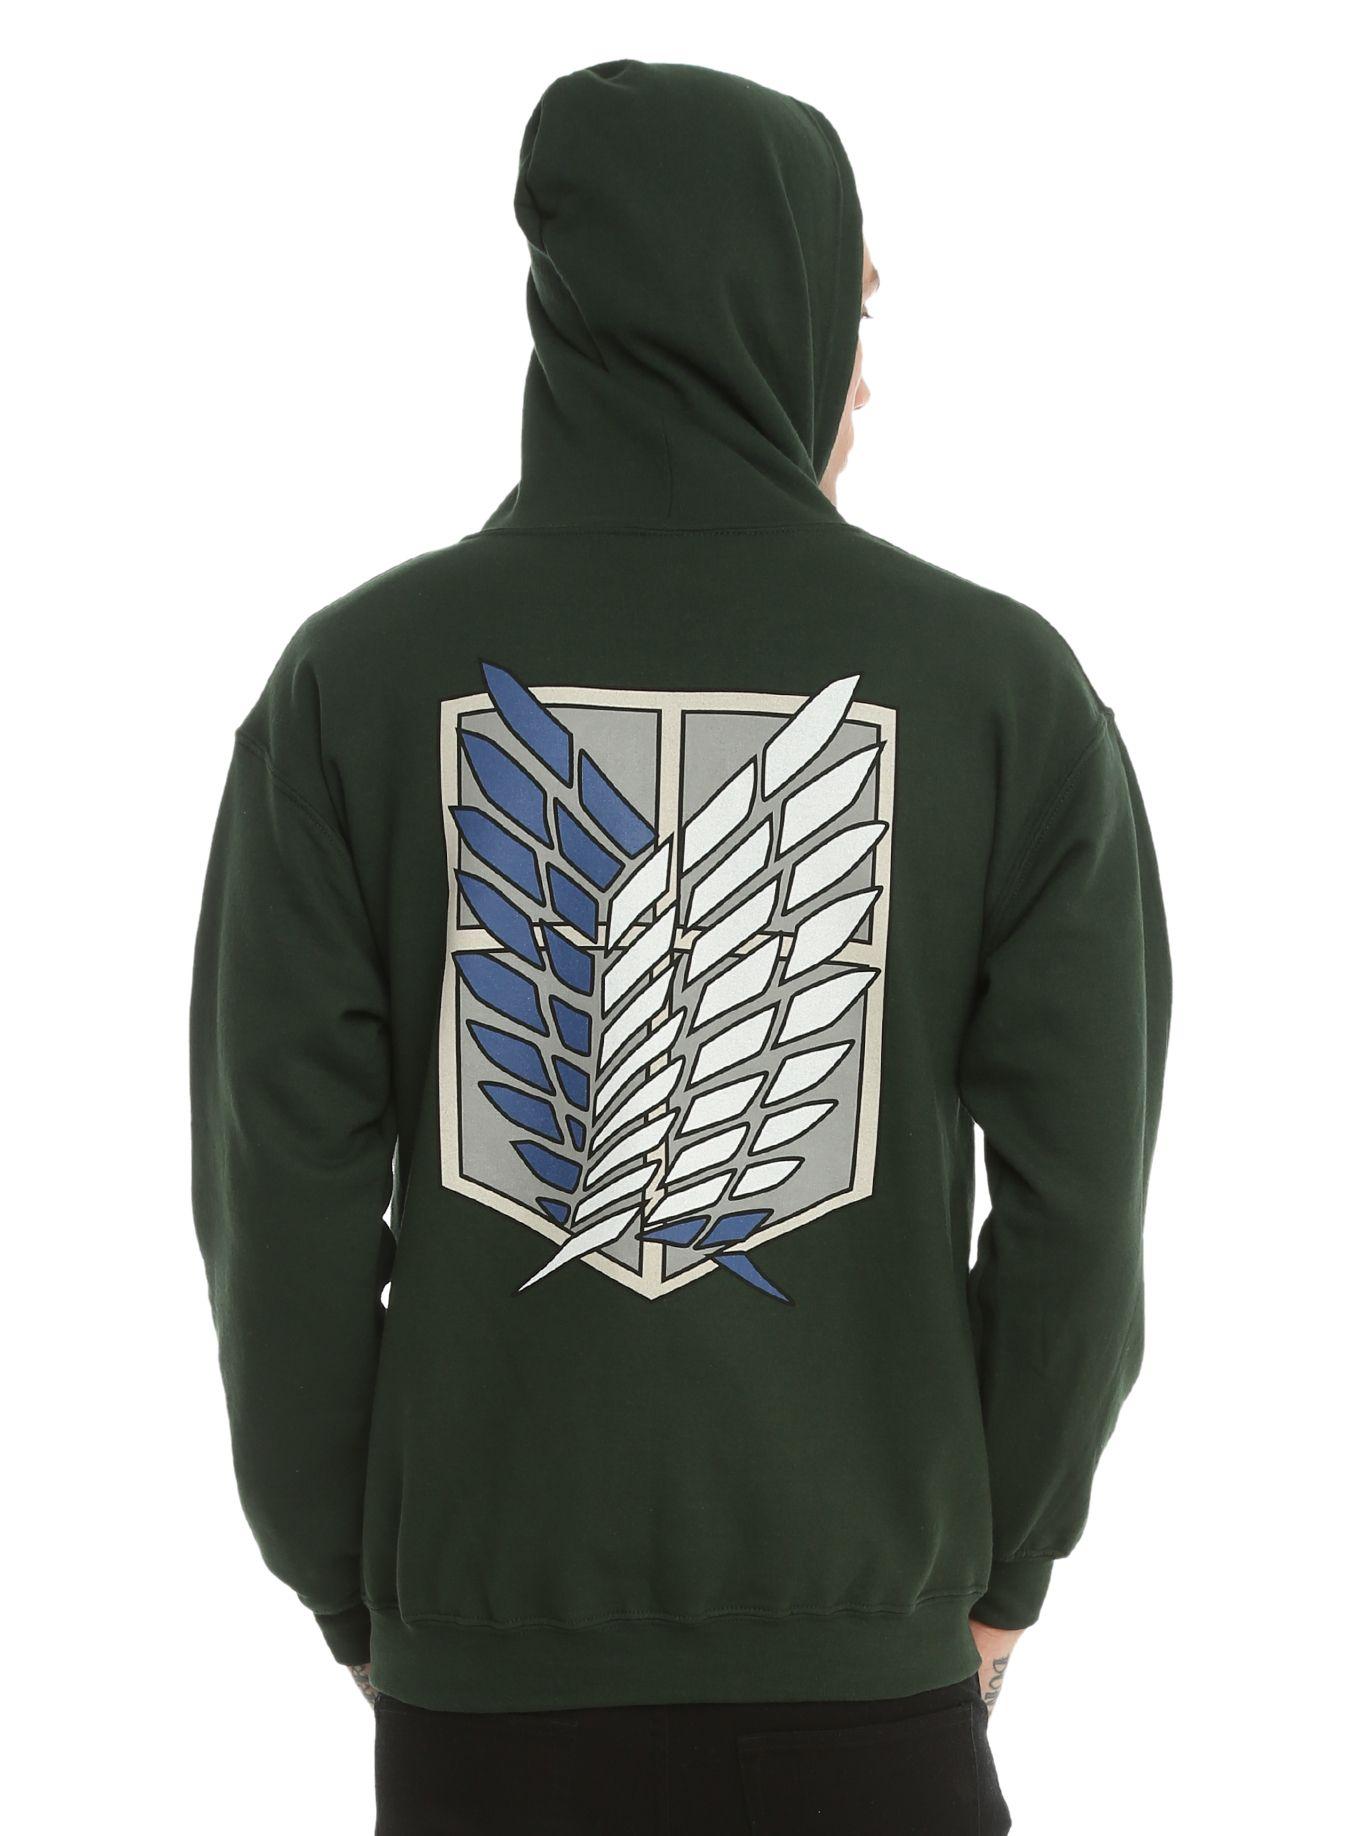 Attack on titan scout regiment shield zip hoodie hoodies